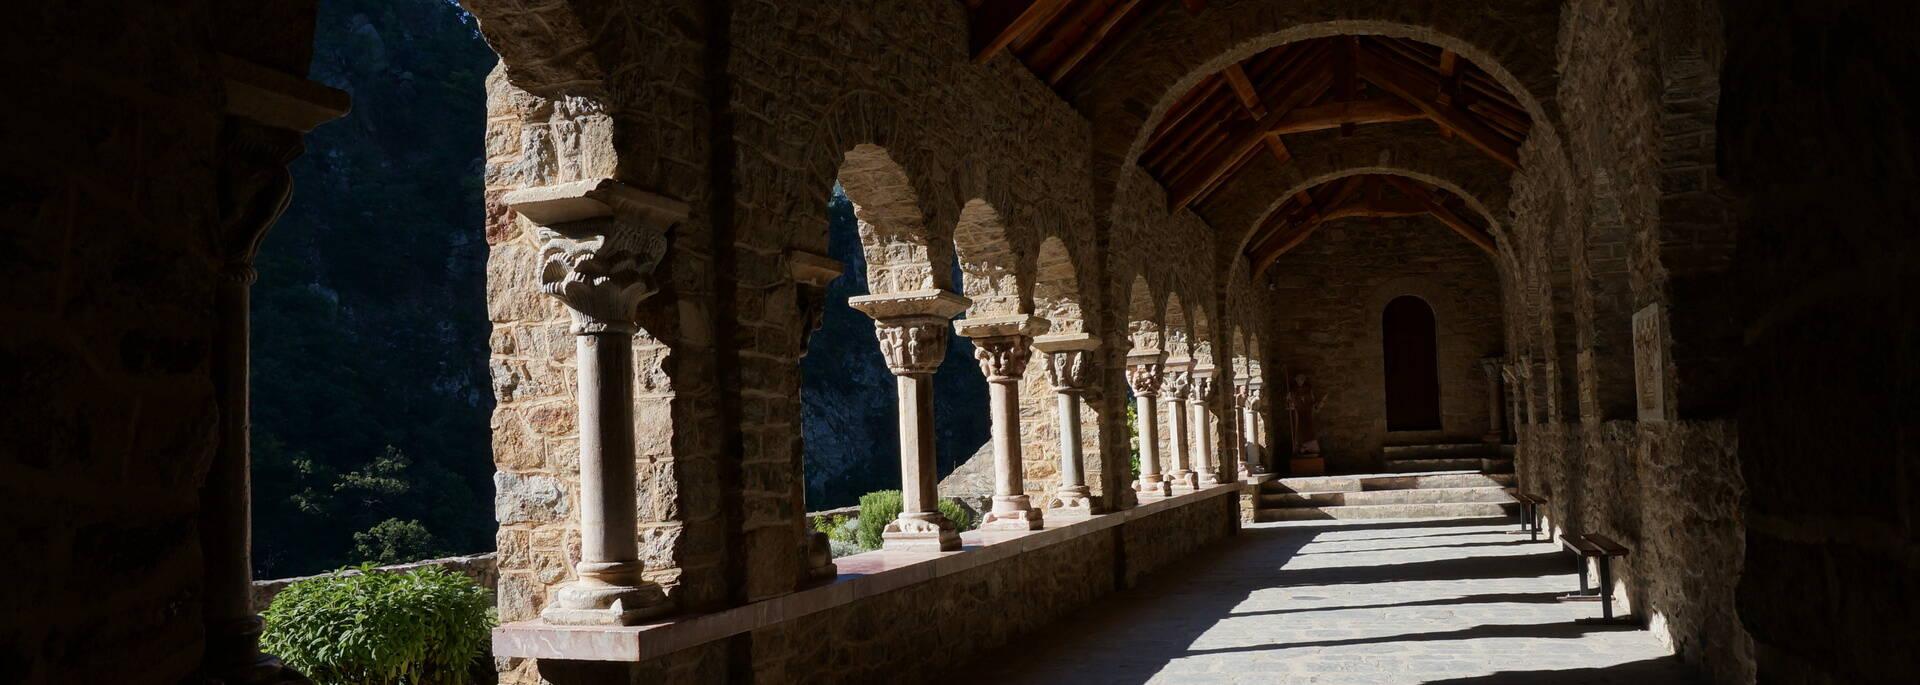 cloître abbaye saint martin du canigou